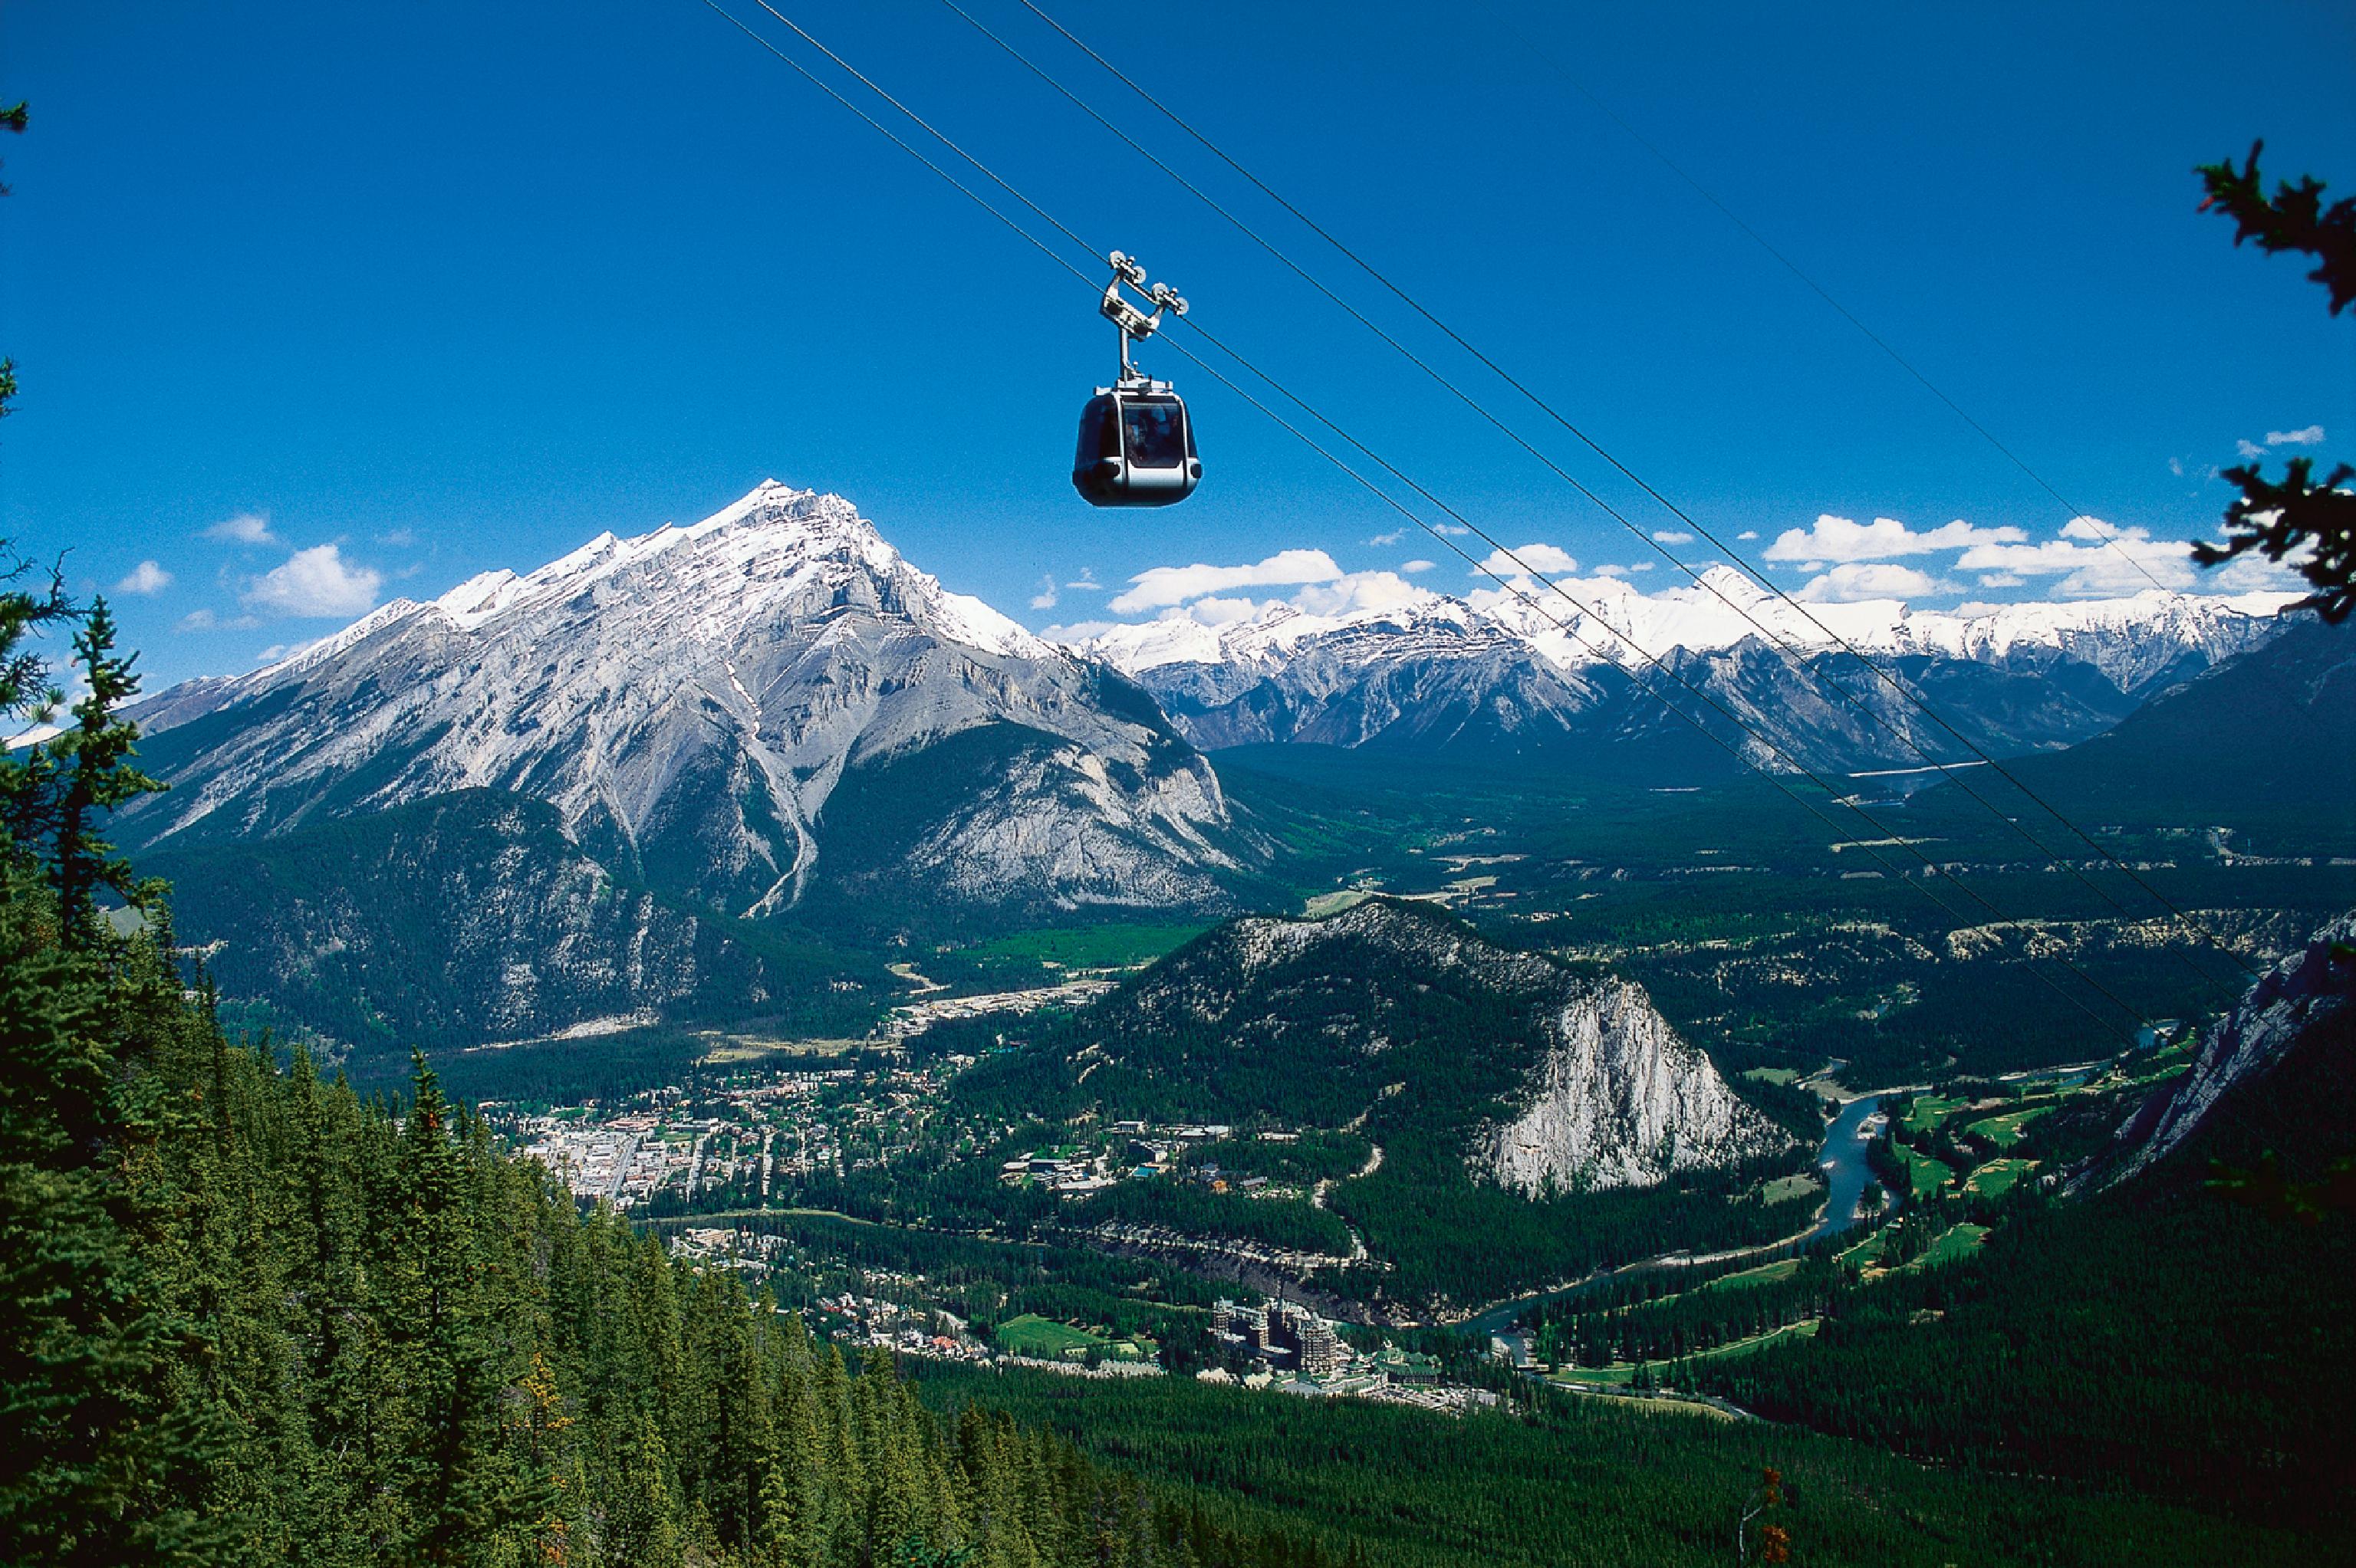 Reaching to the Sky - The Historic Banff Gondola